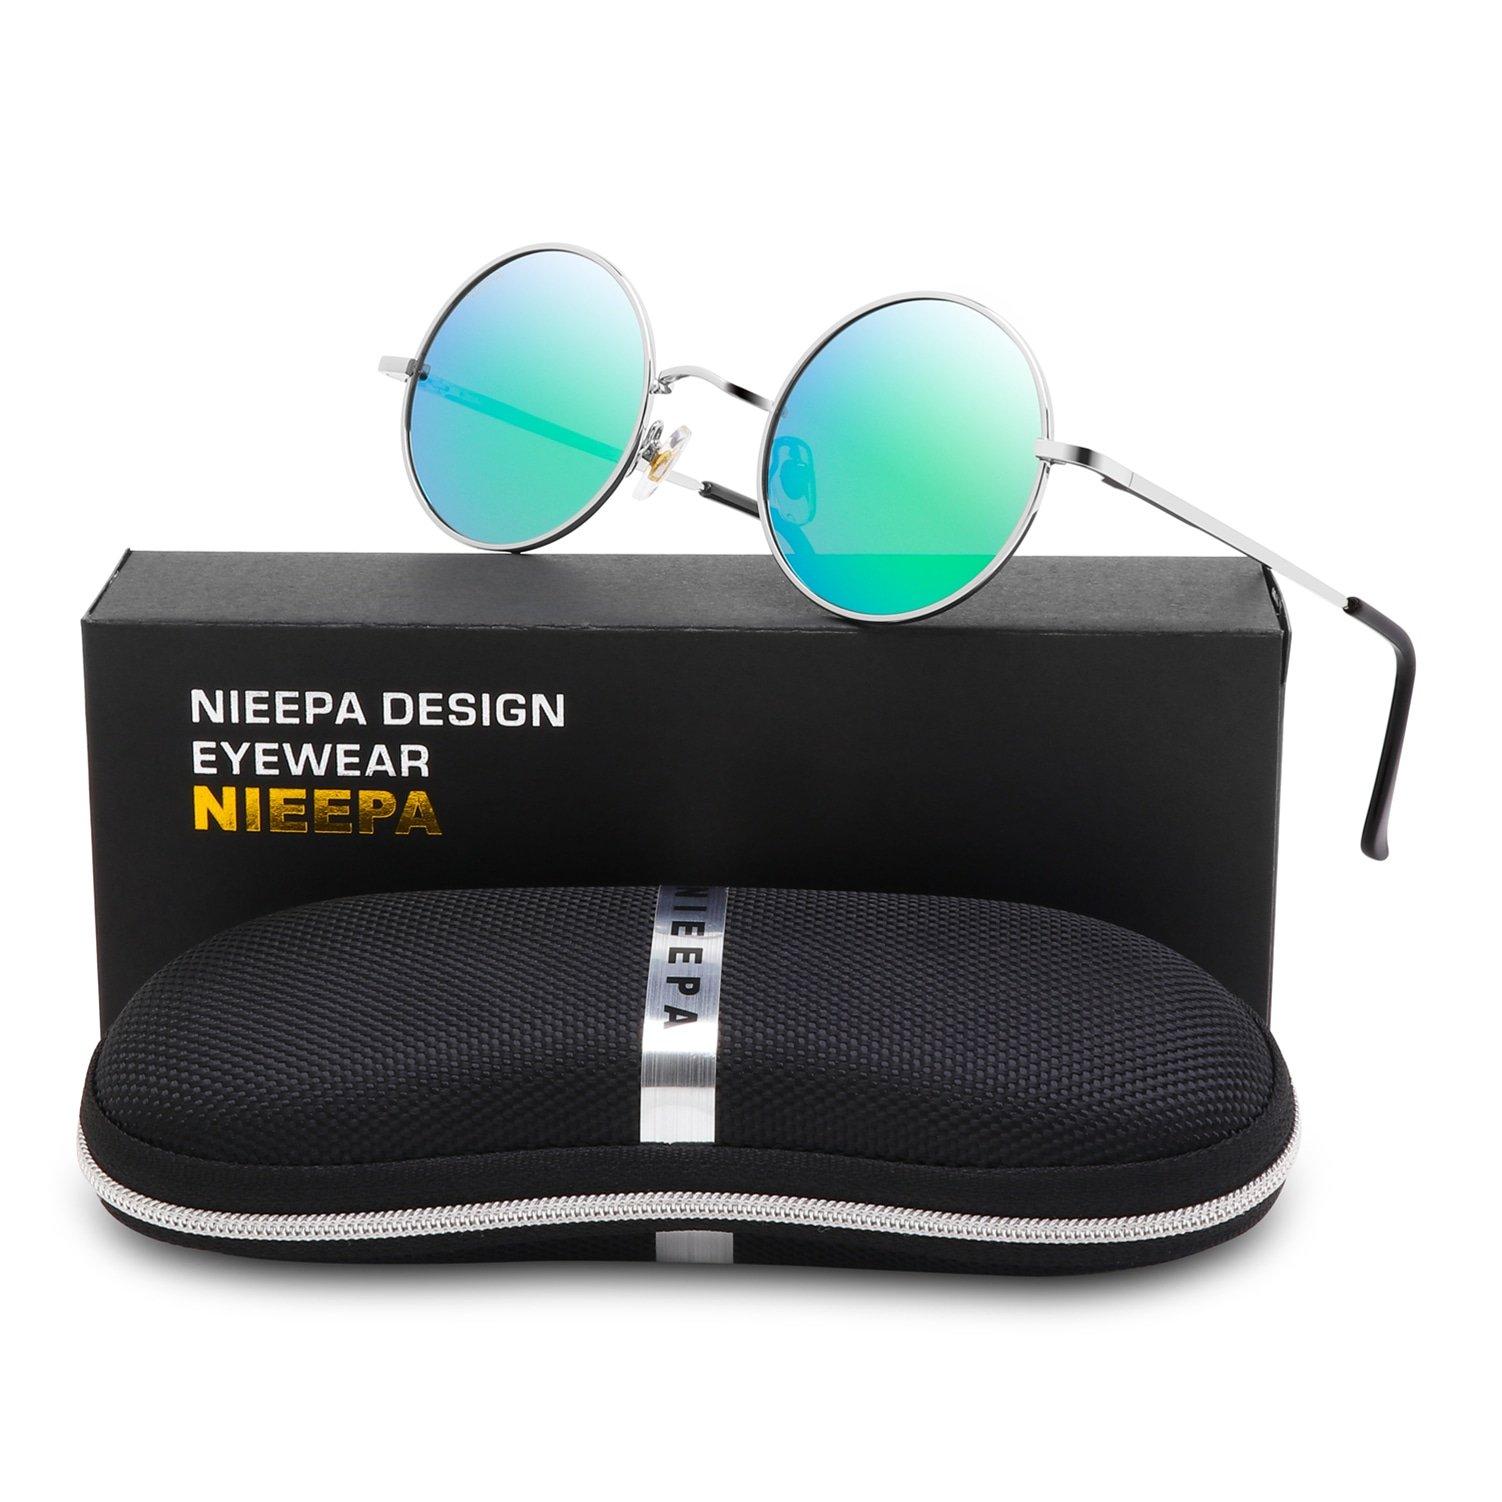 NIEEPA John Lennon Vintage Round Polarized Hippie Sunglasses Small Circle Metal Driving Sun Glasses (Green Lens/Silver Frame)